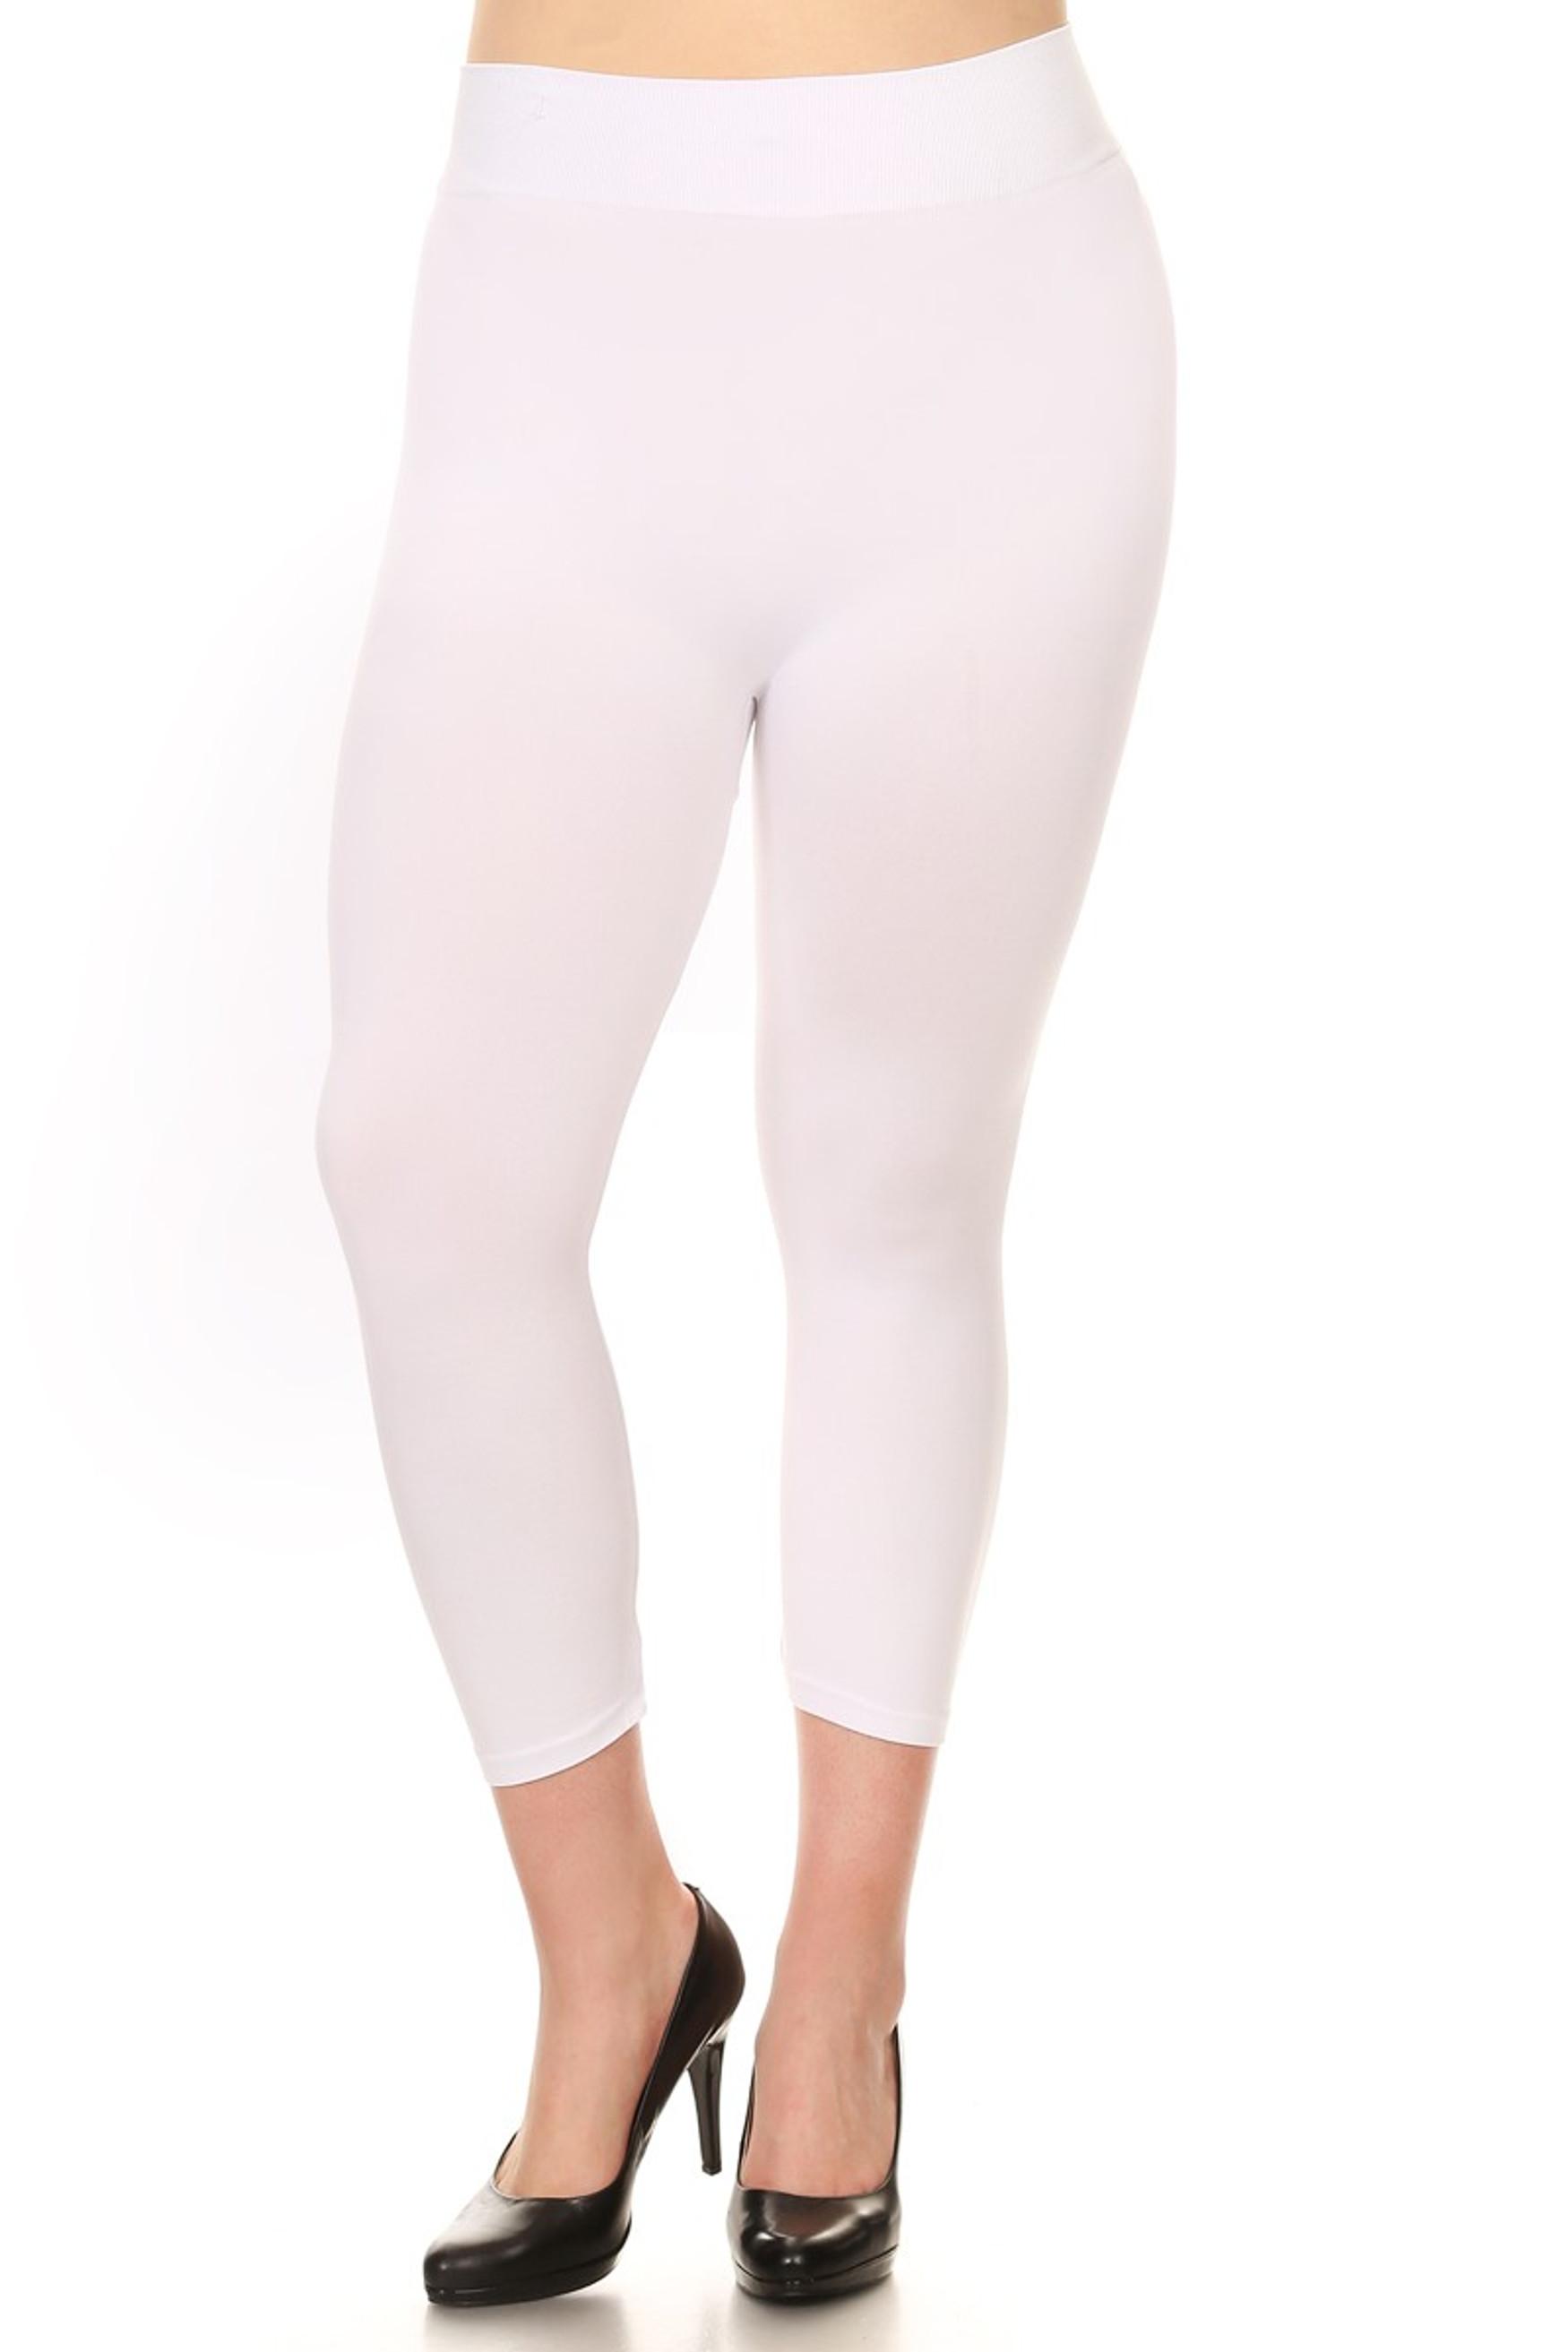 White Basic Spandex Capri Plus Size Leggings